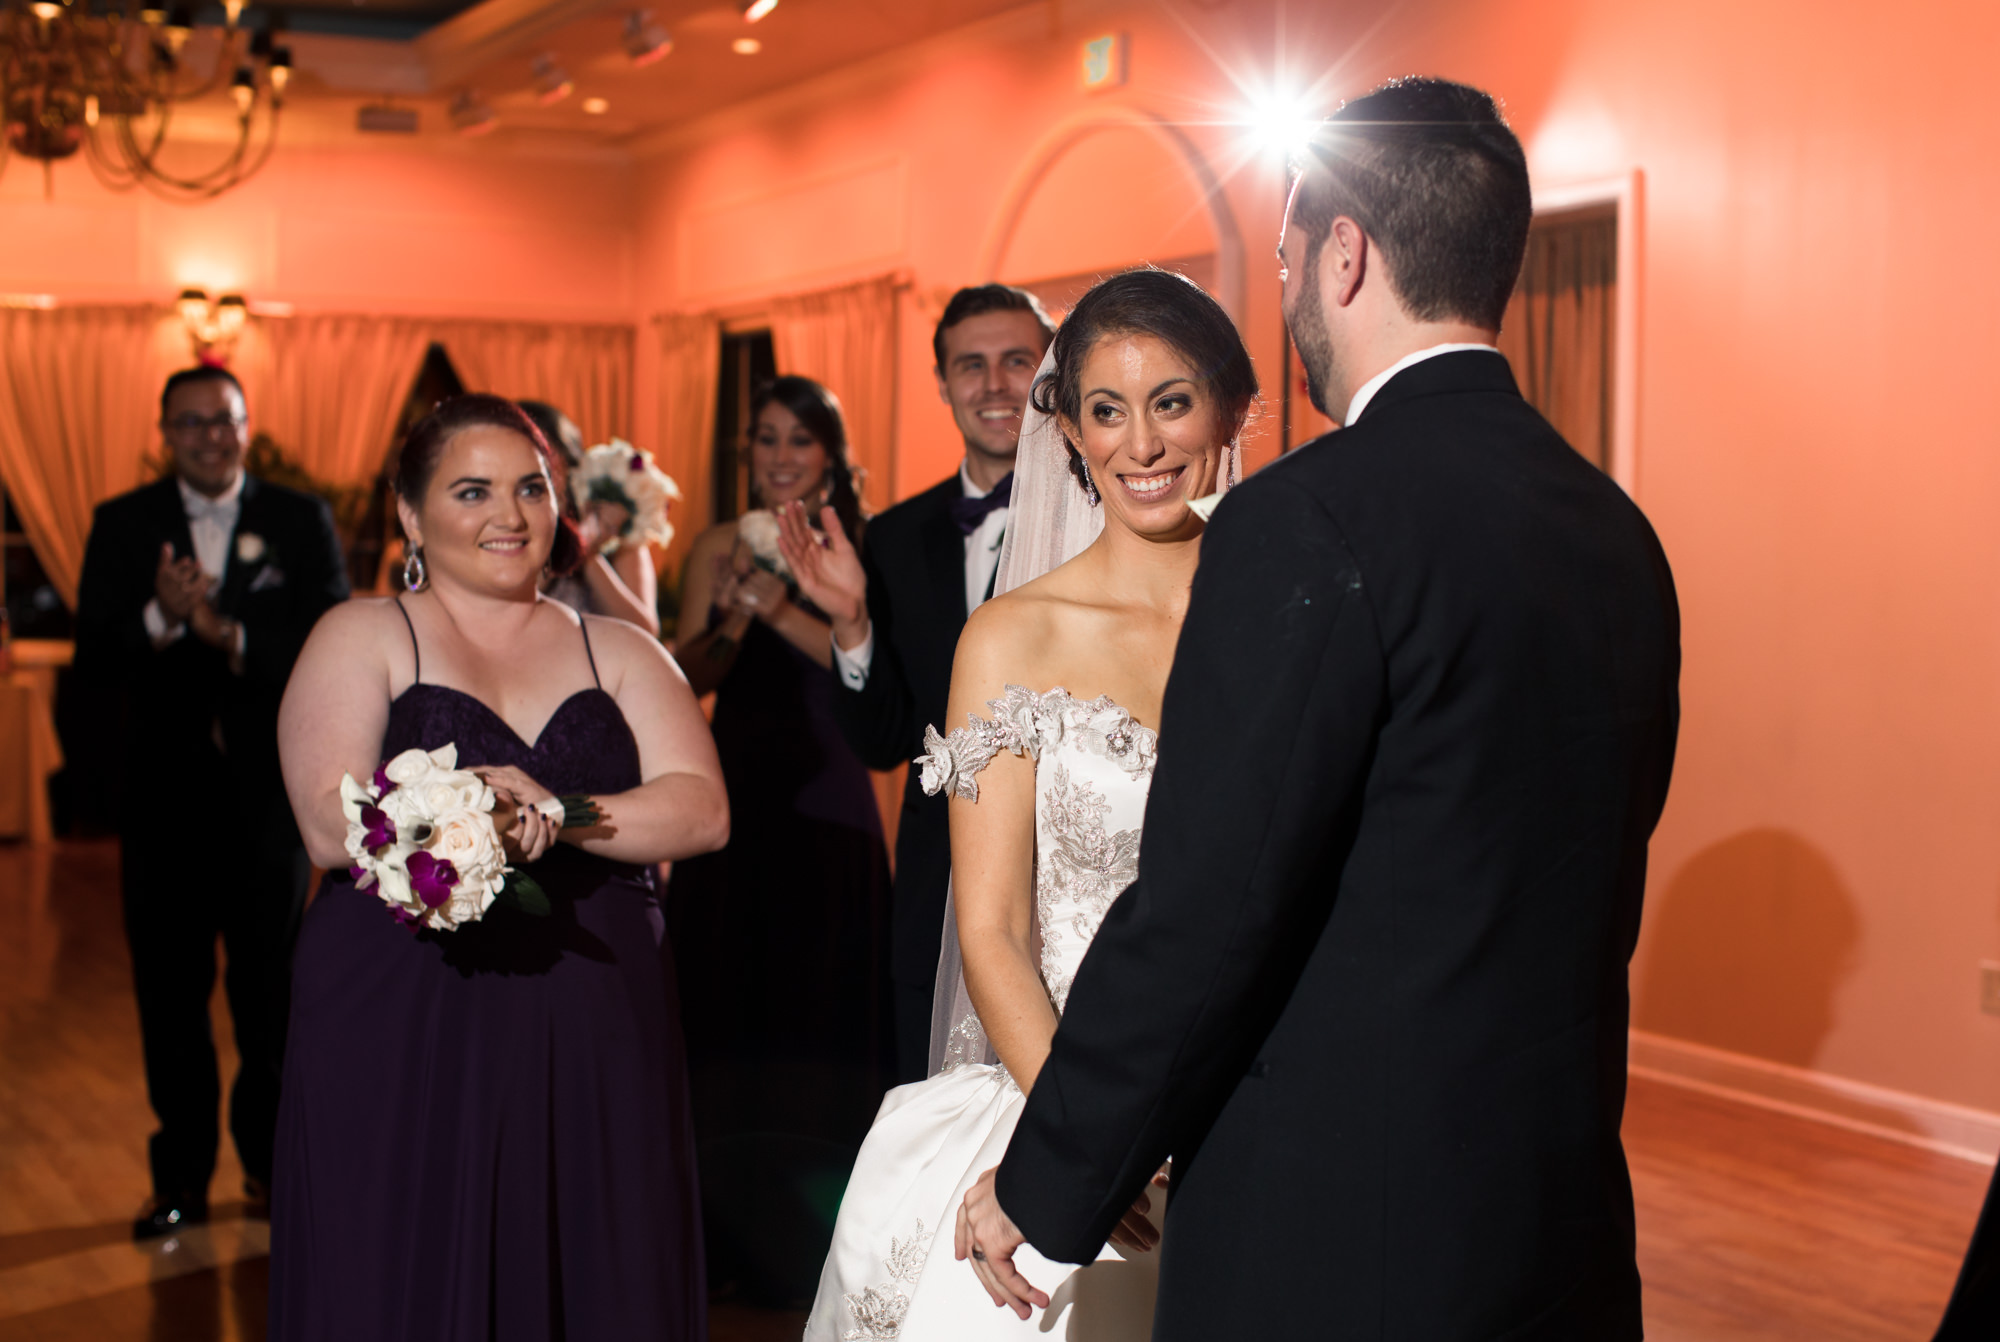 Benvenuto_Wedding_catholic_Florida_Bride-Groom-110.jpg